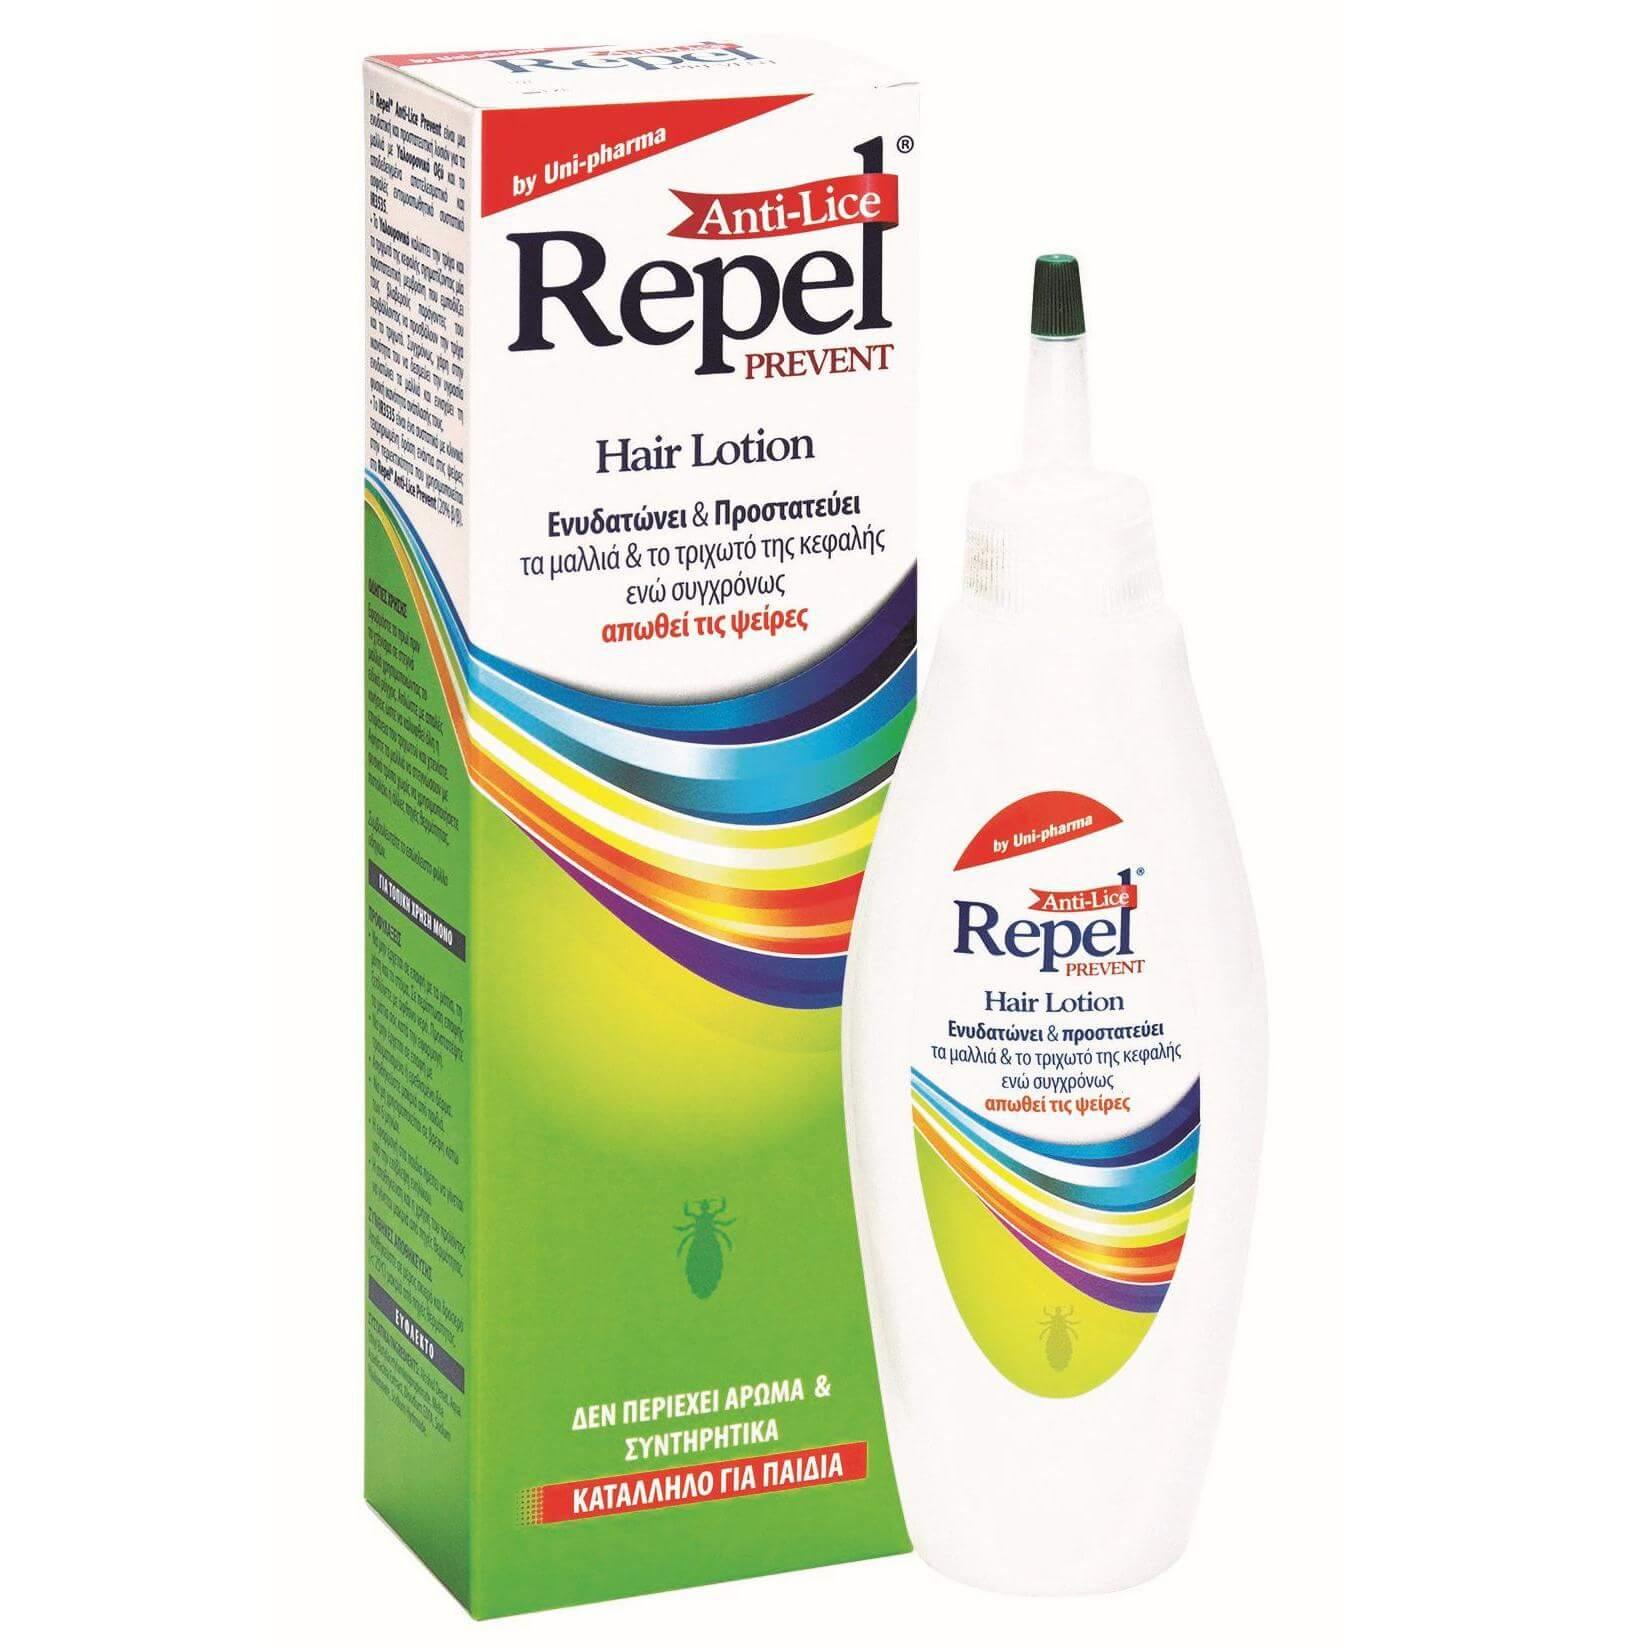 Uni-Pharma Repel Prevent Anti-Lice Hair Lotion Άοσμη Προστασία από τις Ψείρες 200ml